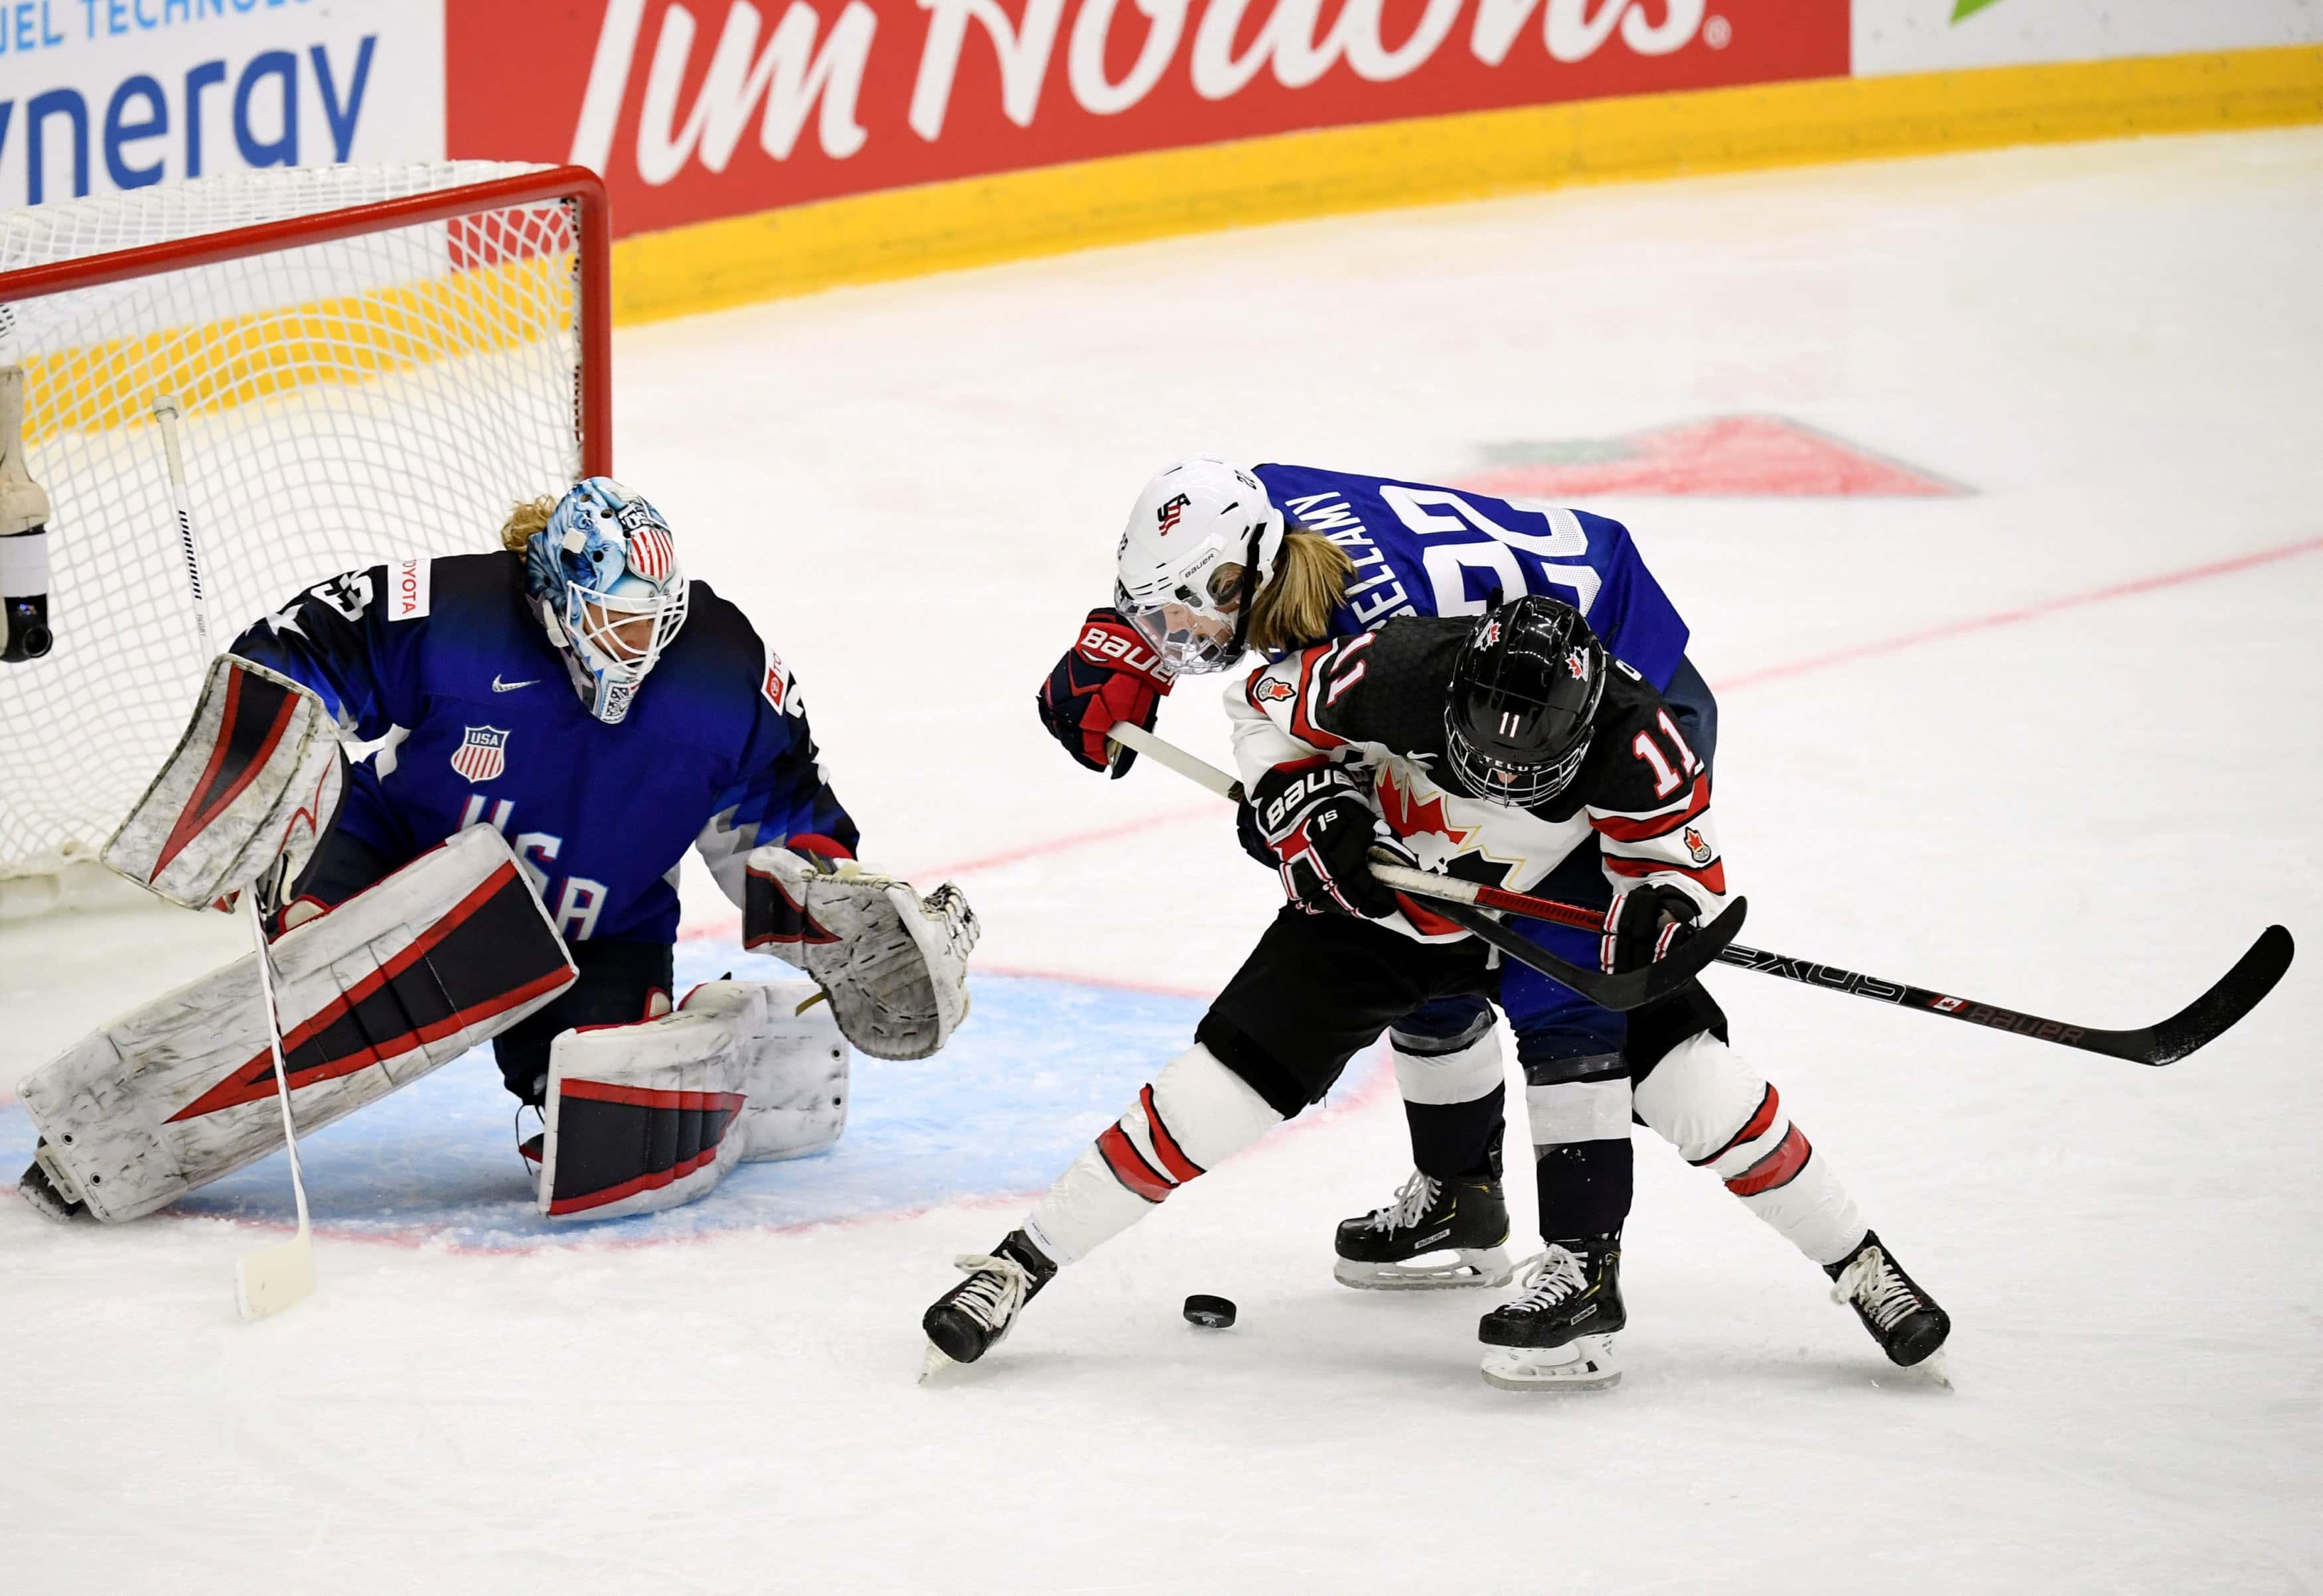 junior hockey world cup 2019 standings